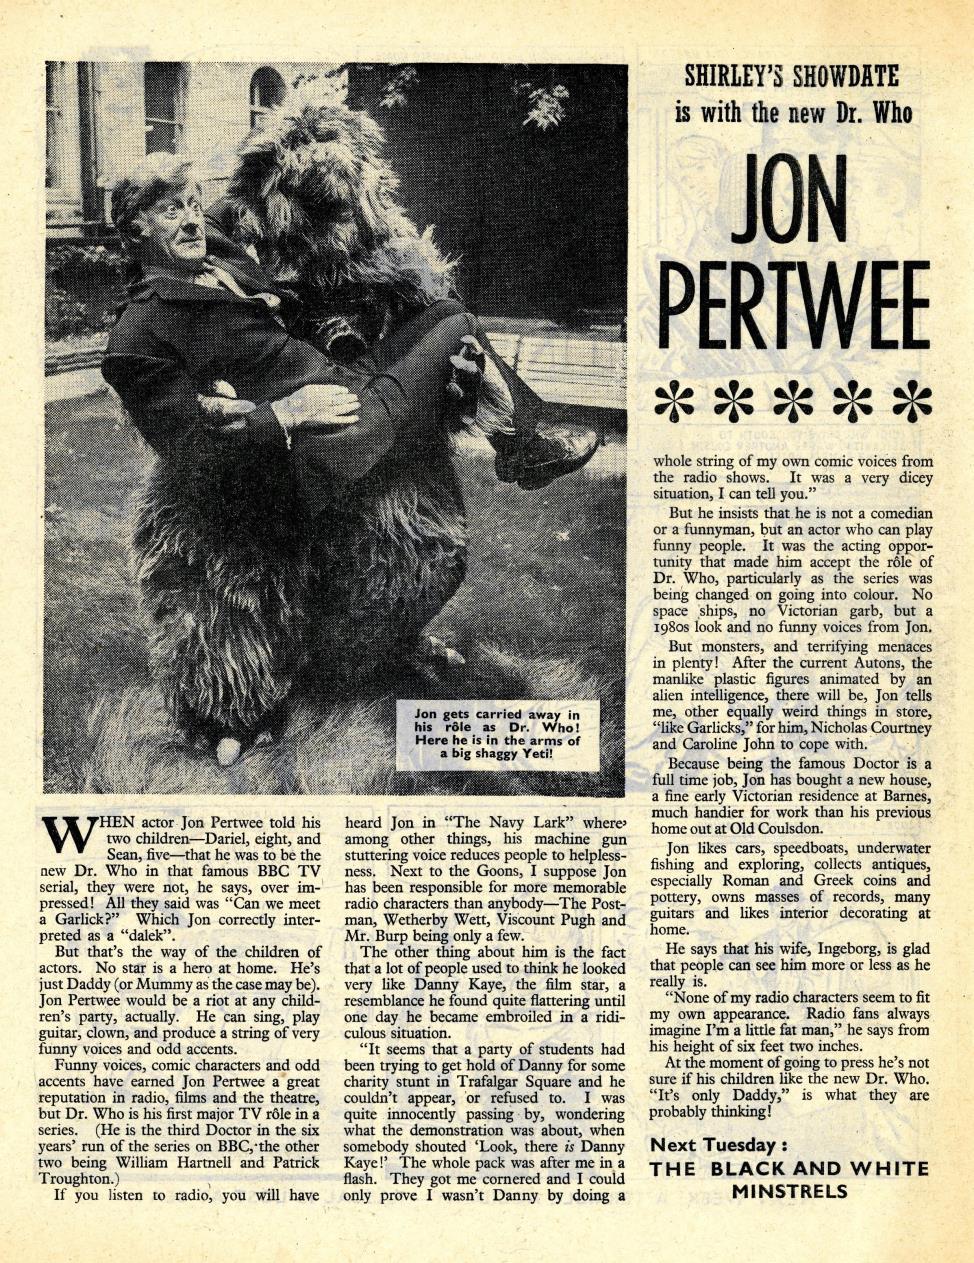 June and School Friend, 7 February 1970